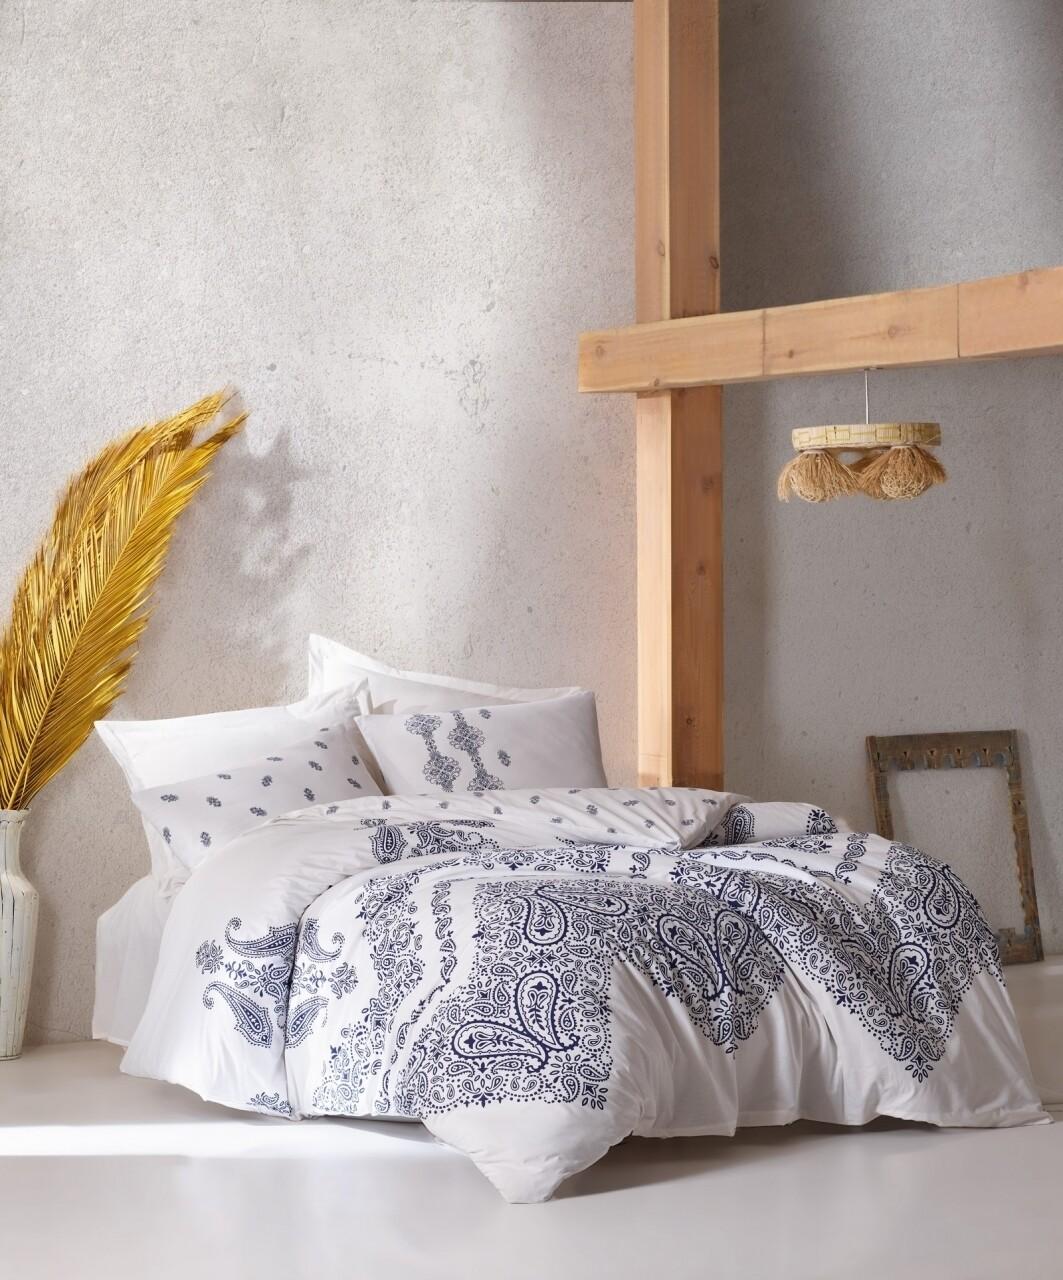 Lenjerie de pat pentru o persoana, 3 piese, 100% bumbac ranforce, Cotton Box, Adonis